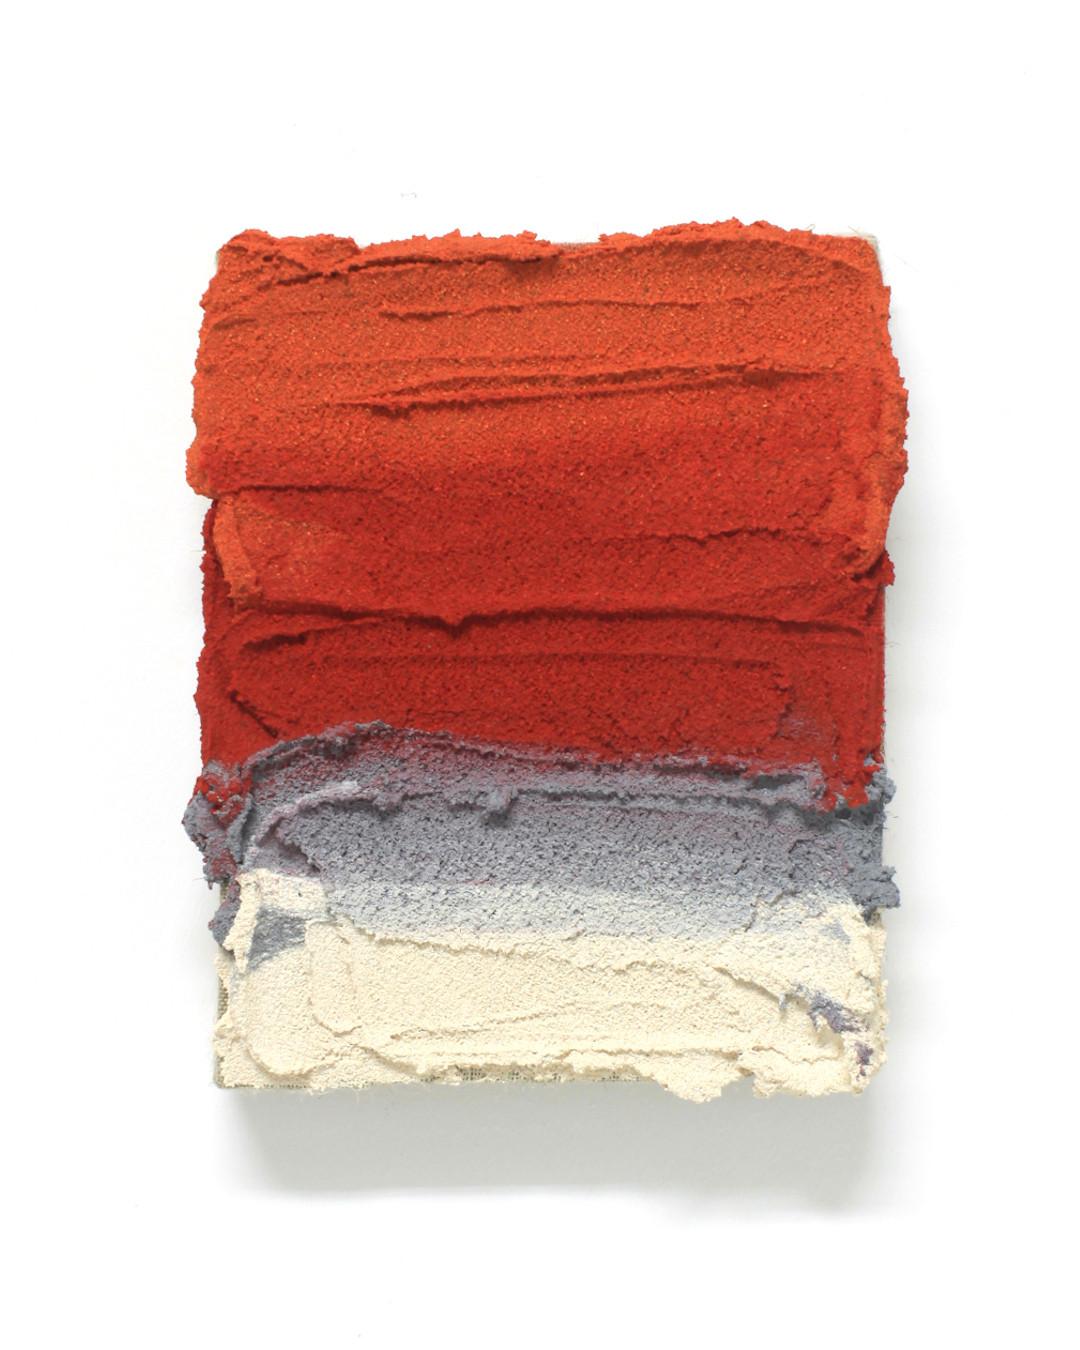 PR23, 2020. Acrylic, sand and limestone on linen. 20 x 16 cm.